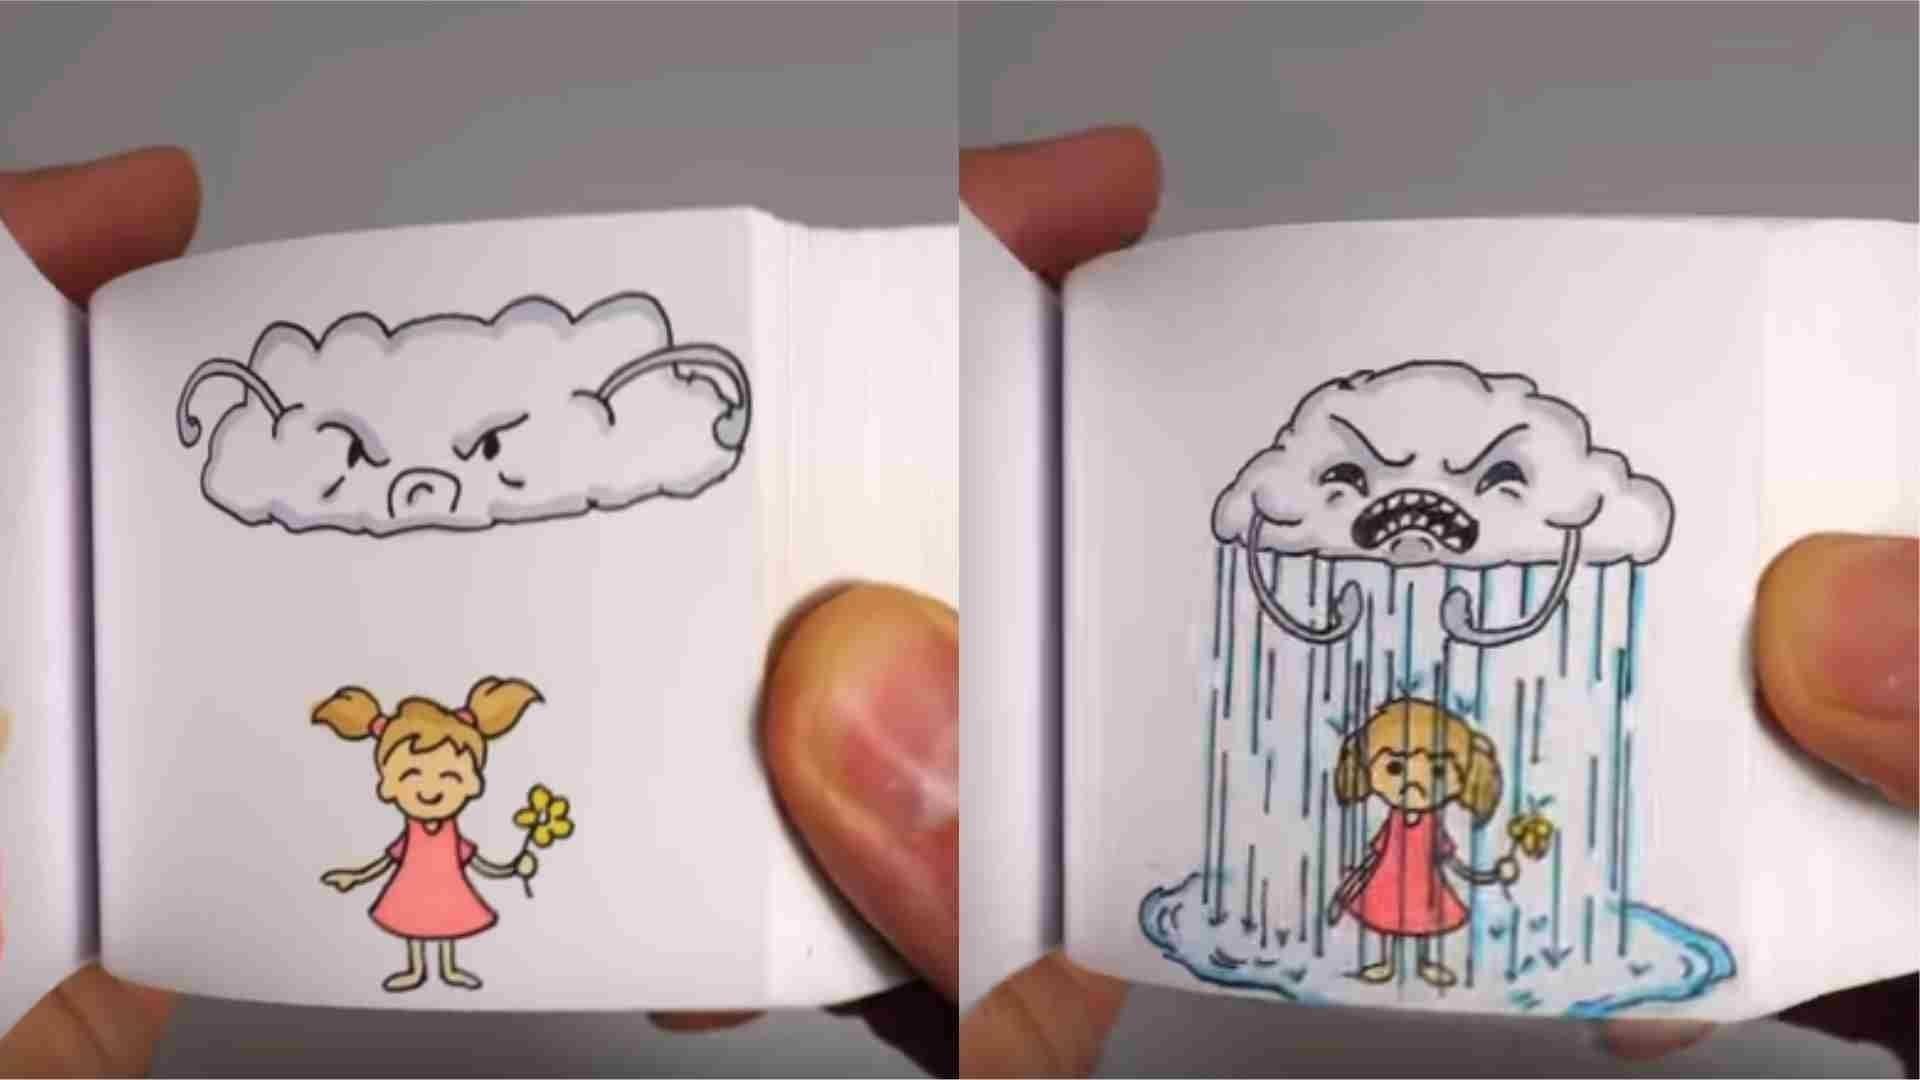 cartoon and character sketching (flip art animation) - Cartoon and Character Sketching Flip Art Animation C12 01 03 - Cartoon and Character Sketching (Flip Art Animation)